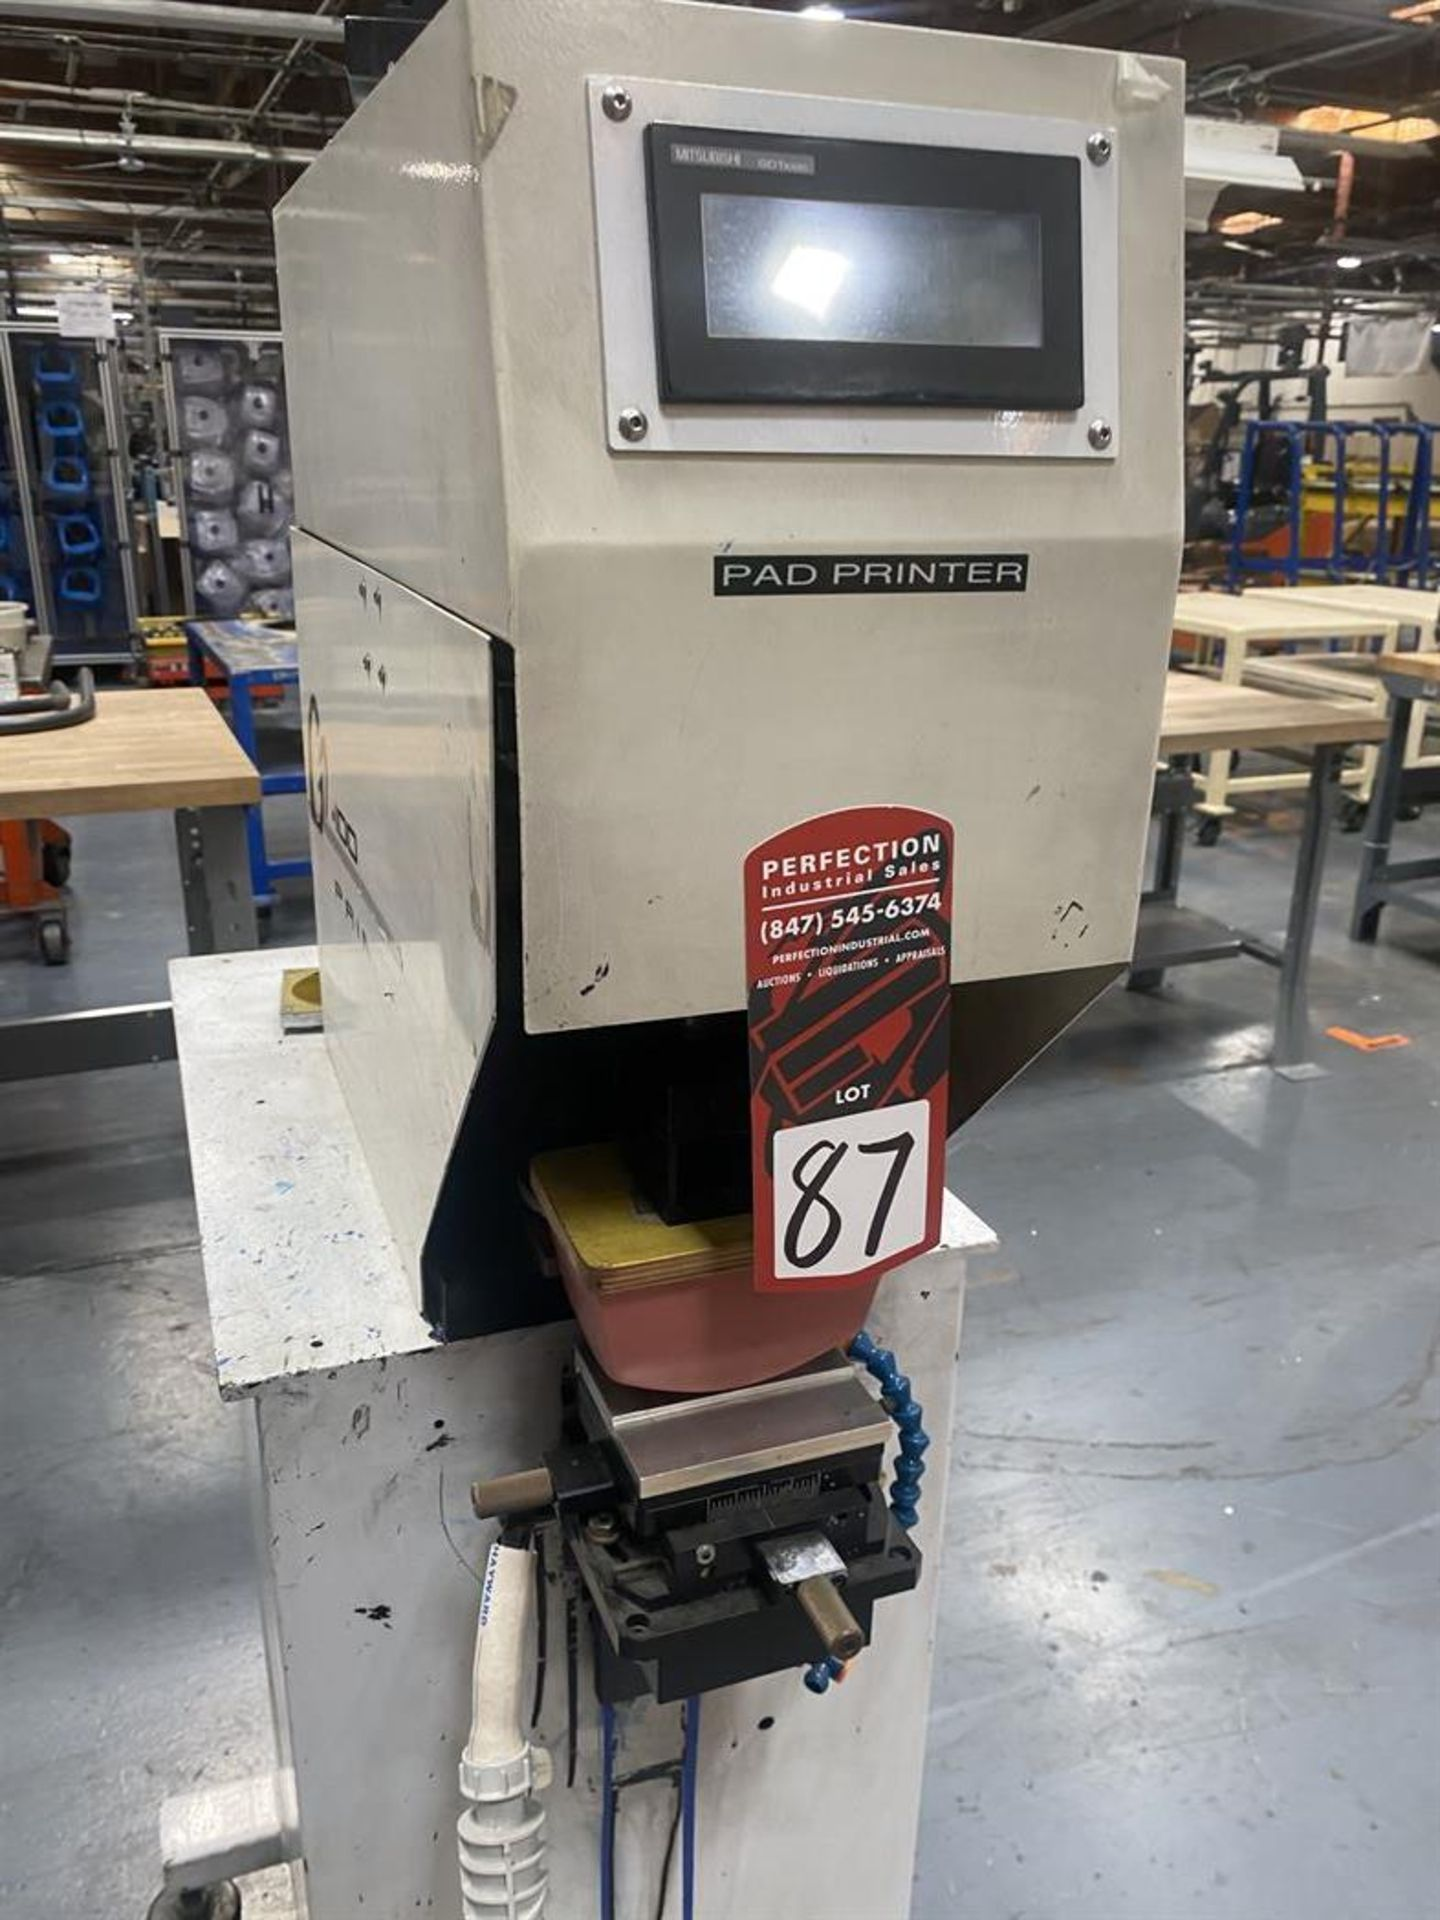 Lot 87 - Printex G2-100 Pad Printing Machine, s/n na, Mitsubishi GOT1000 PLC